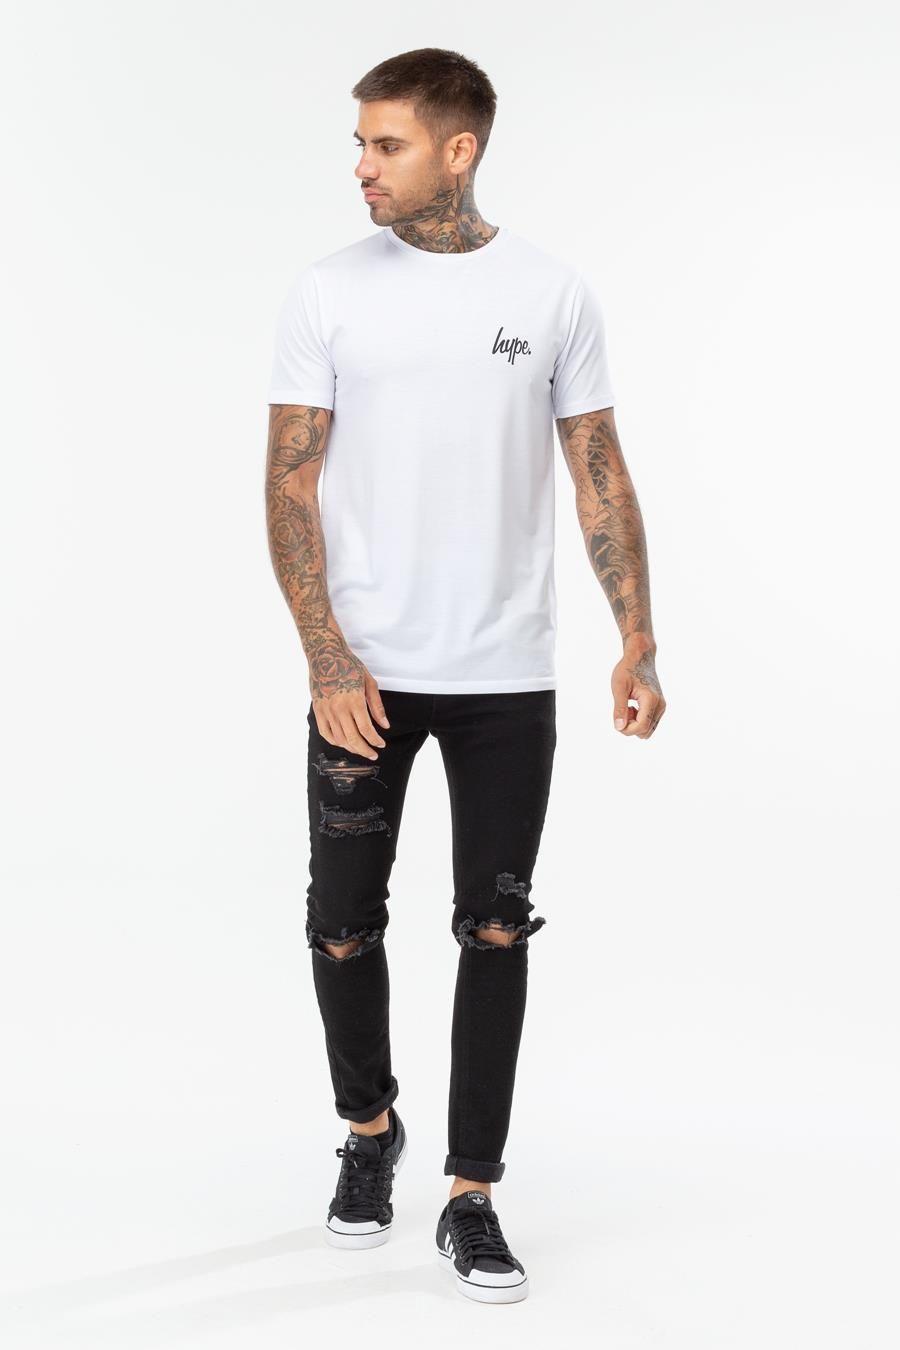 Hype Toy Story White Slinky Capital Mens T-Shirt